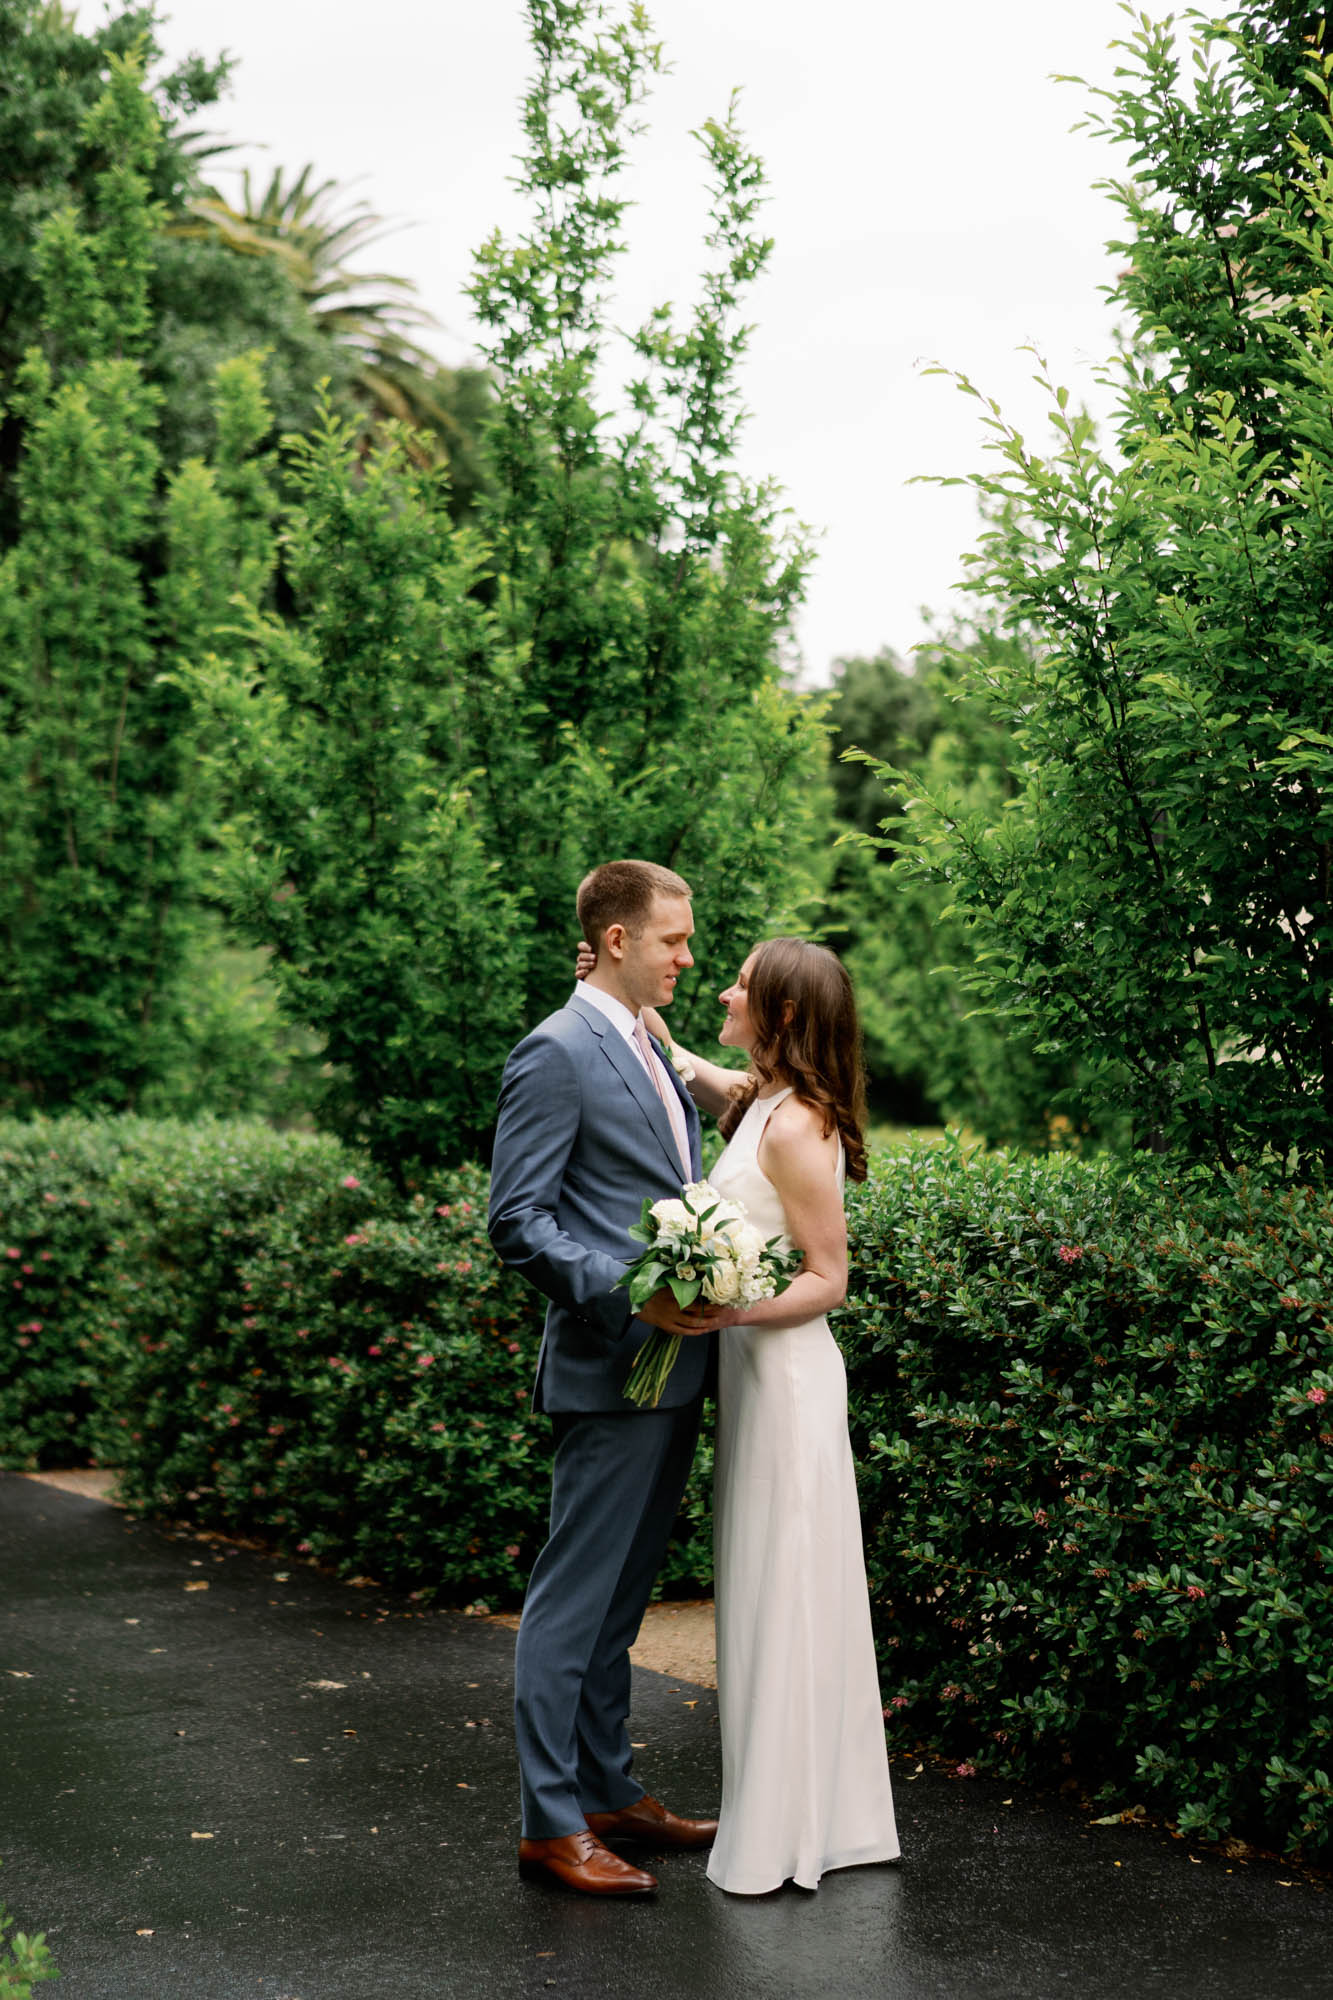 Vina Enoteca Palo Alto Wedding 012.jpg